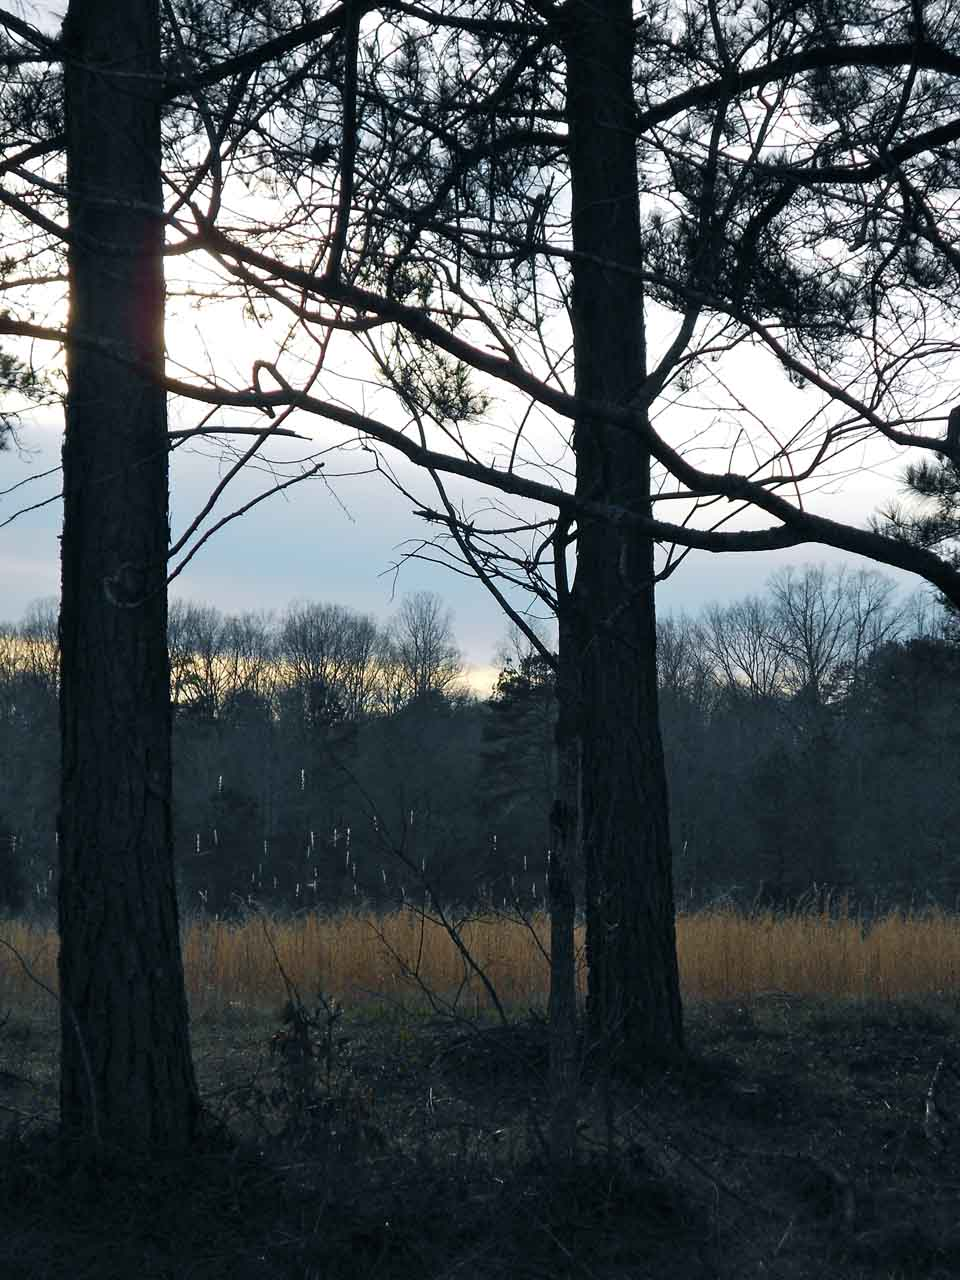 RW_Pinetrees-0809.JPG